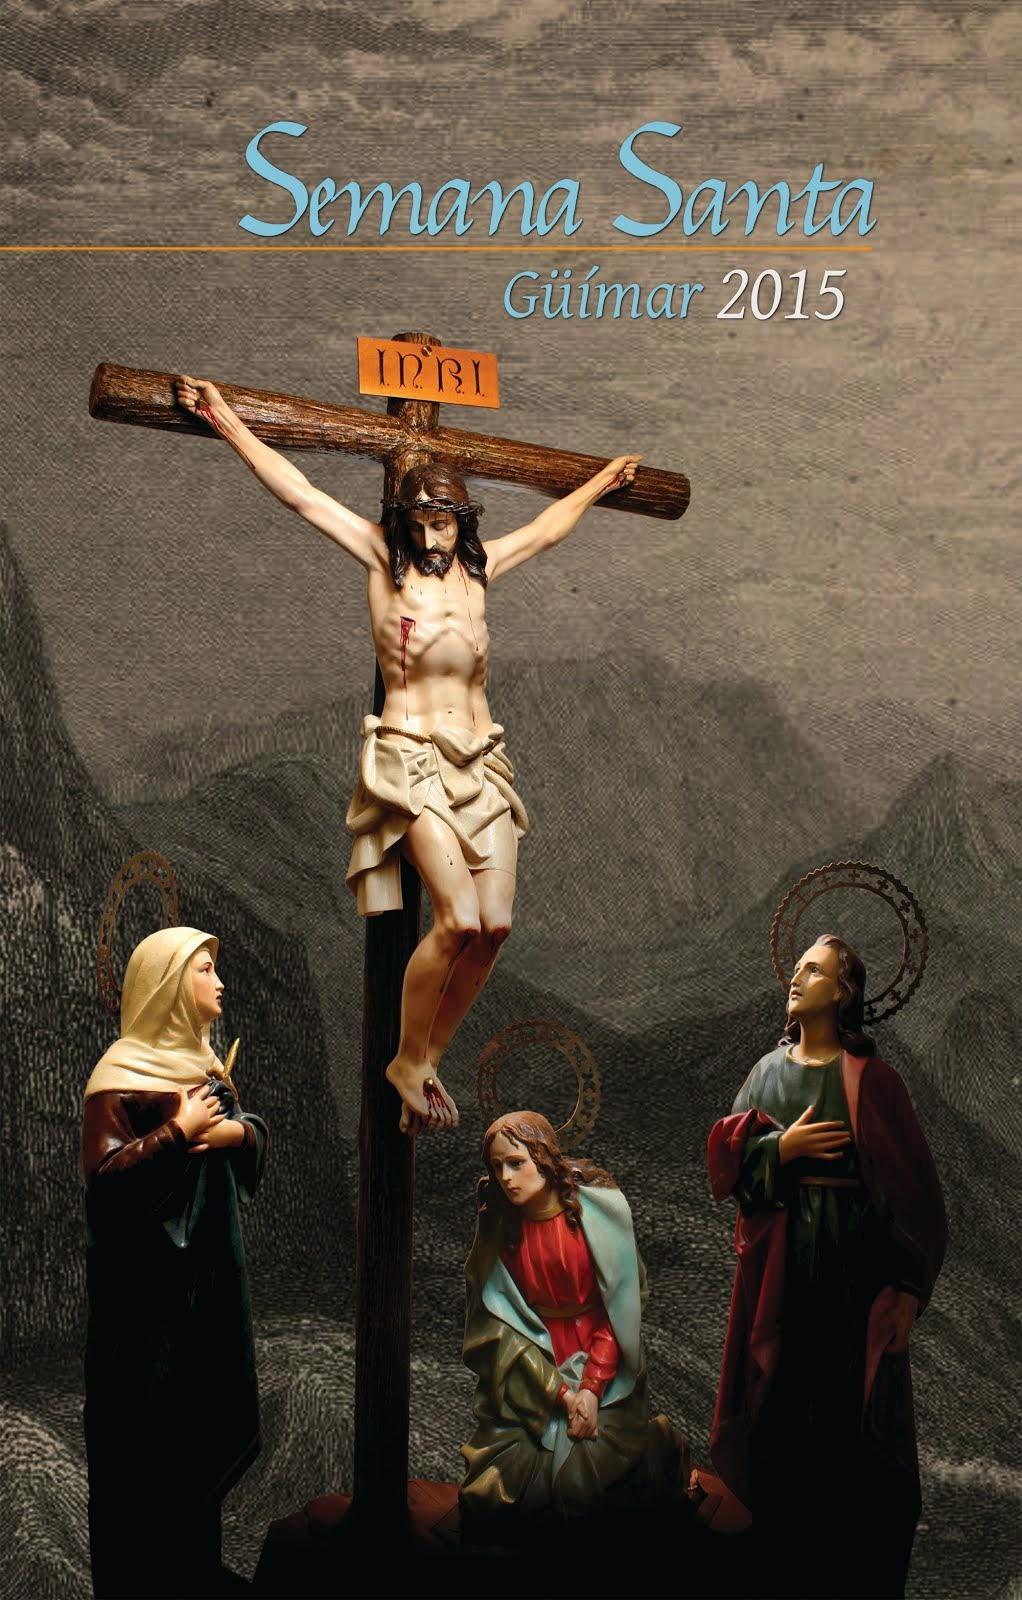 Programa de Semana Santa 2015. Pincha en la imagen